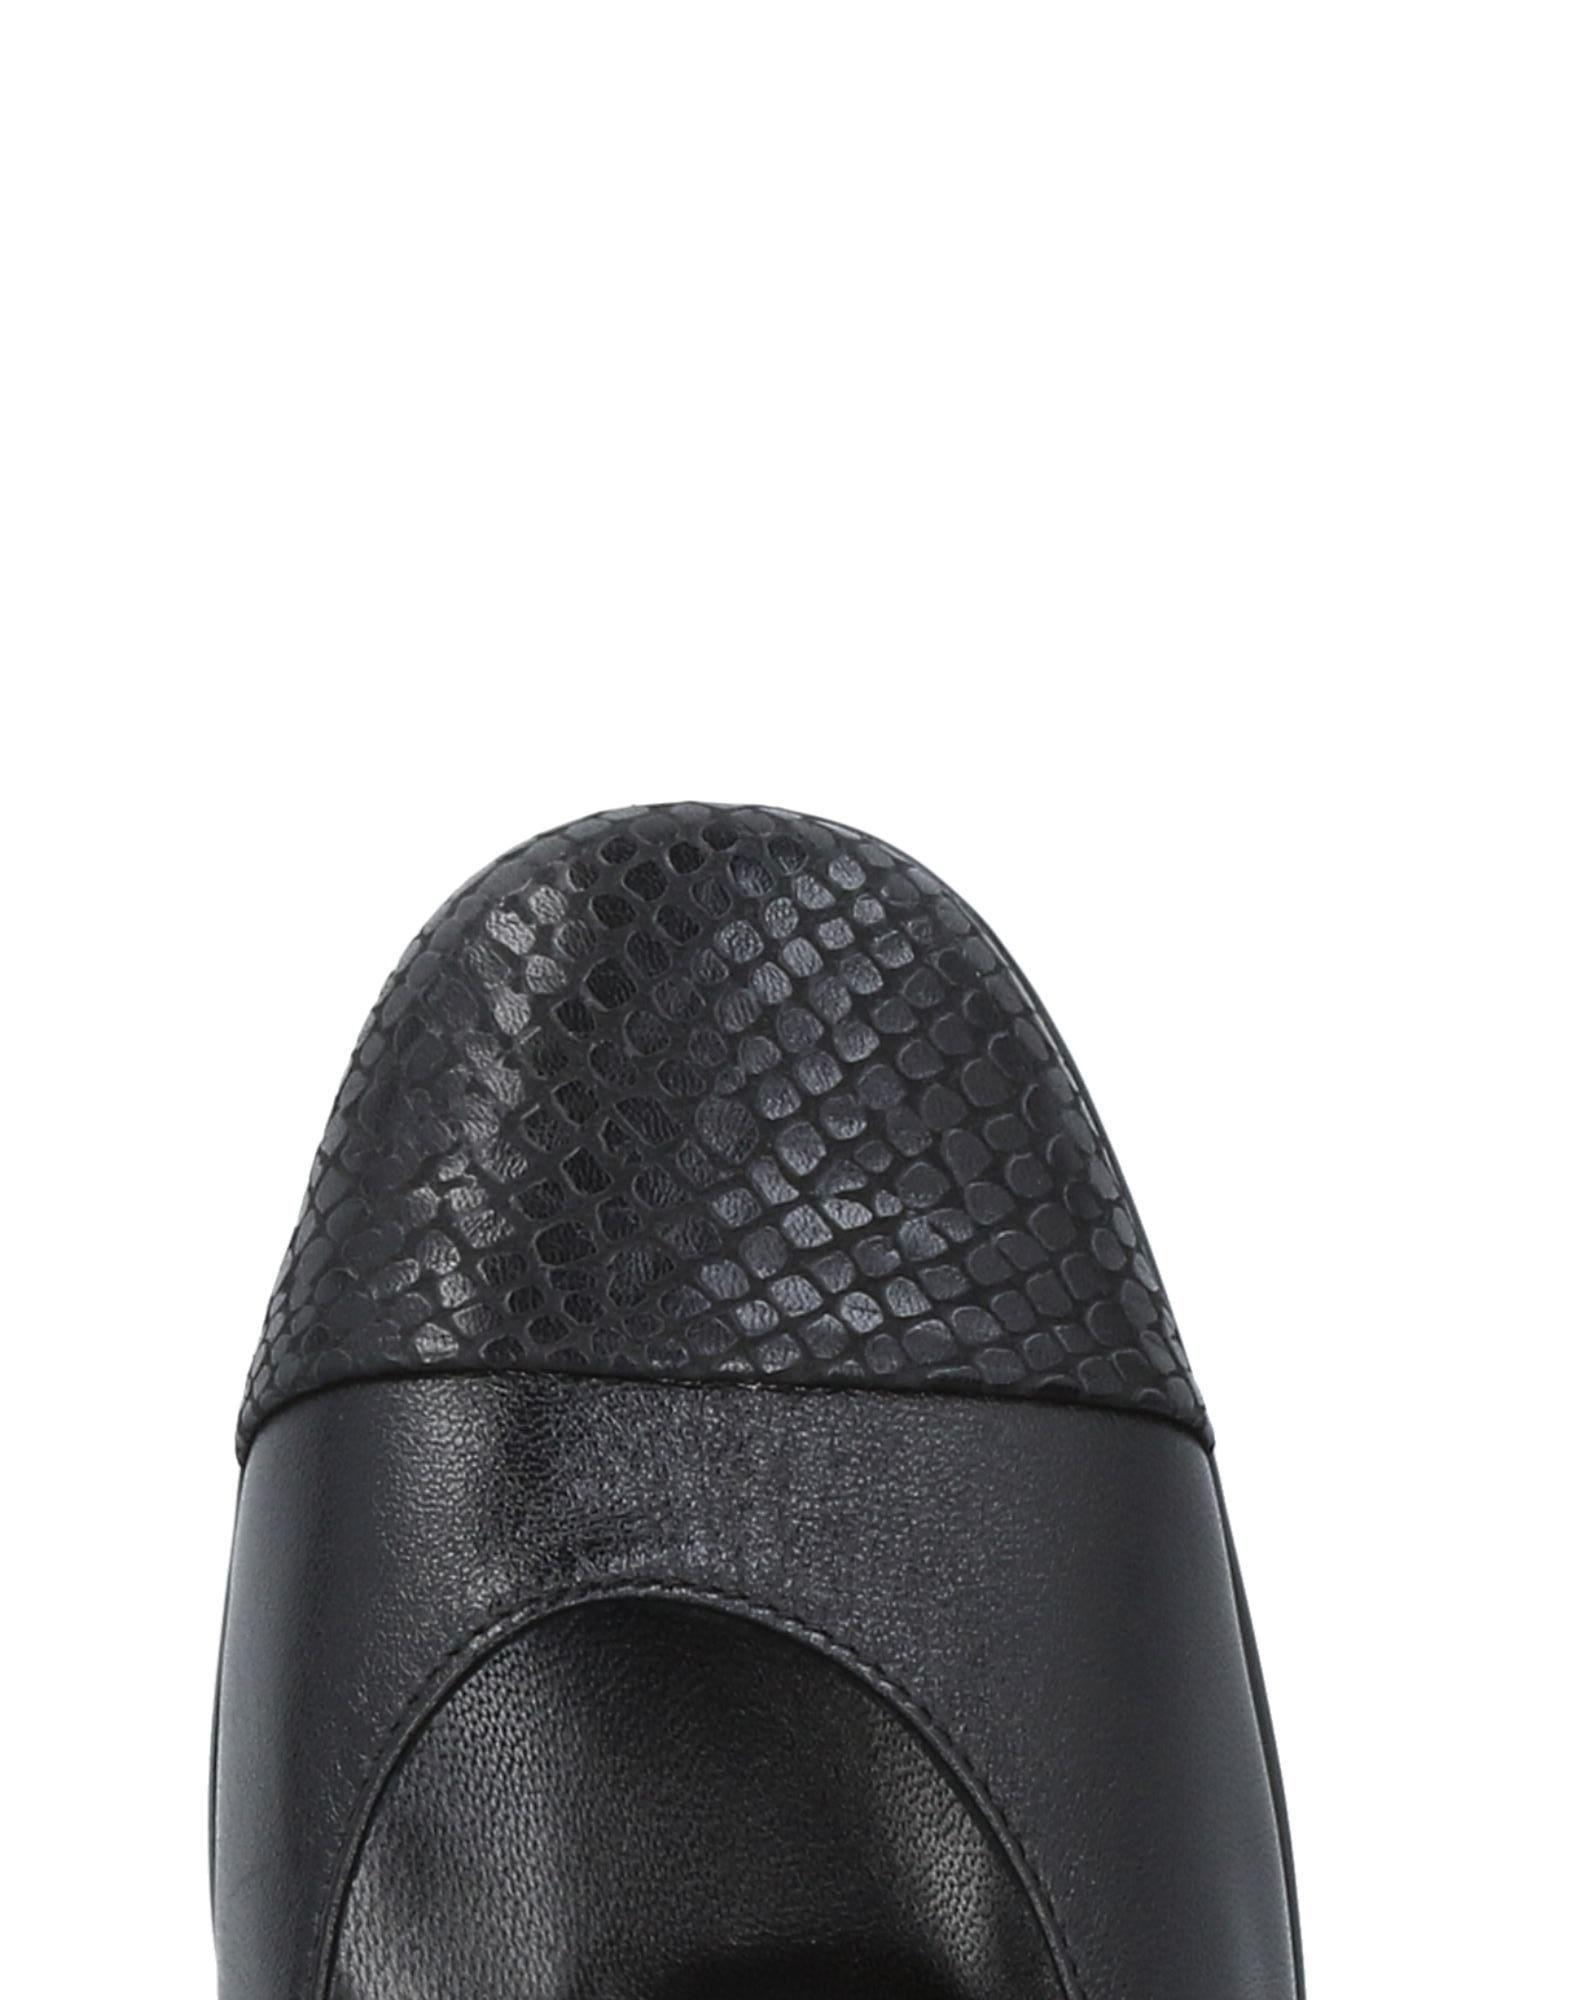 Le Marinē Pumps Damen beliebte  11485903ID Gute Qualität beliebte Damen Schuhe 453fa3